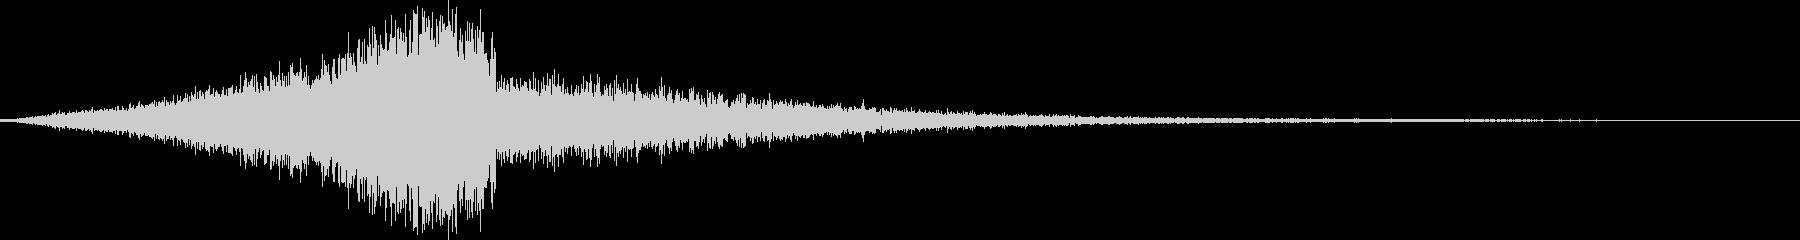 CINEMATIC REVERSE_01の未再生の波形